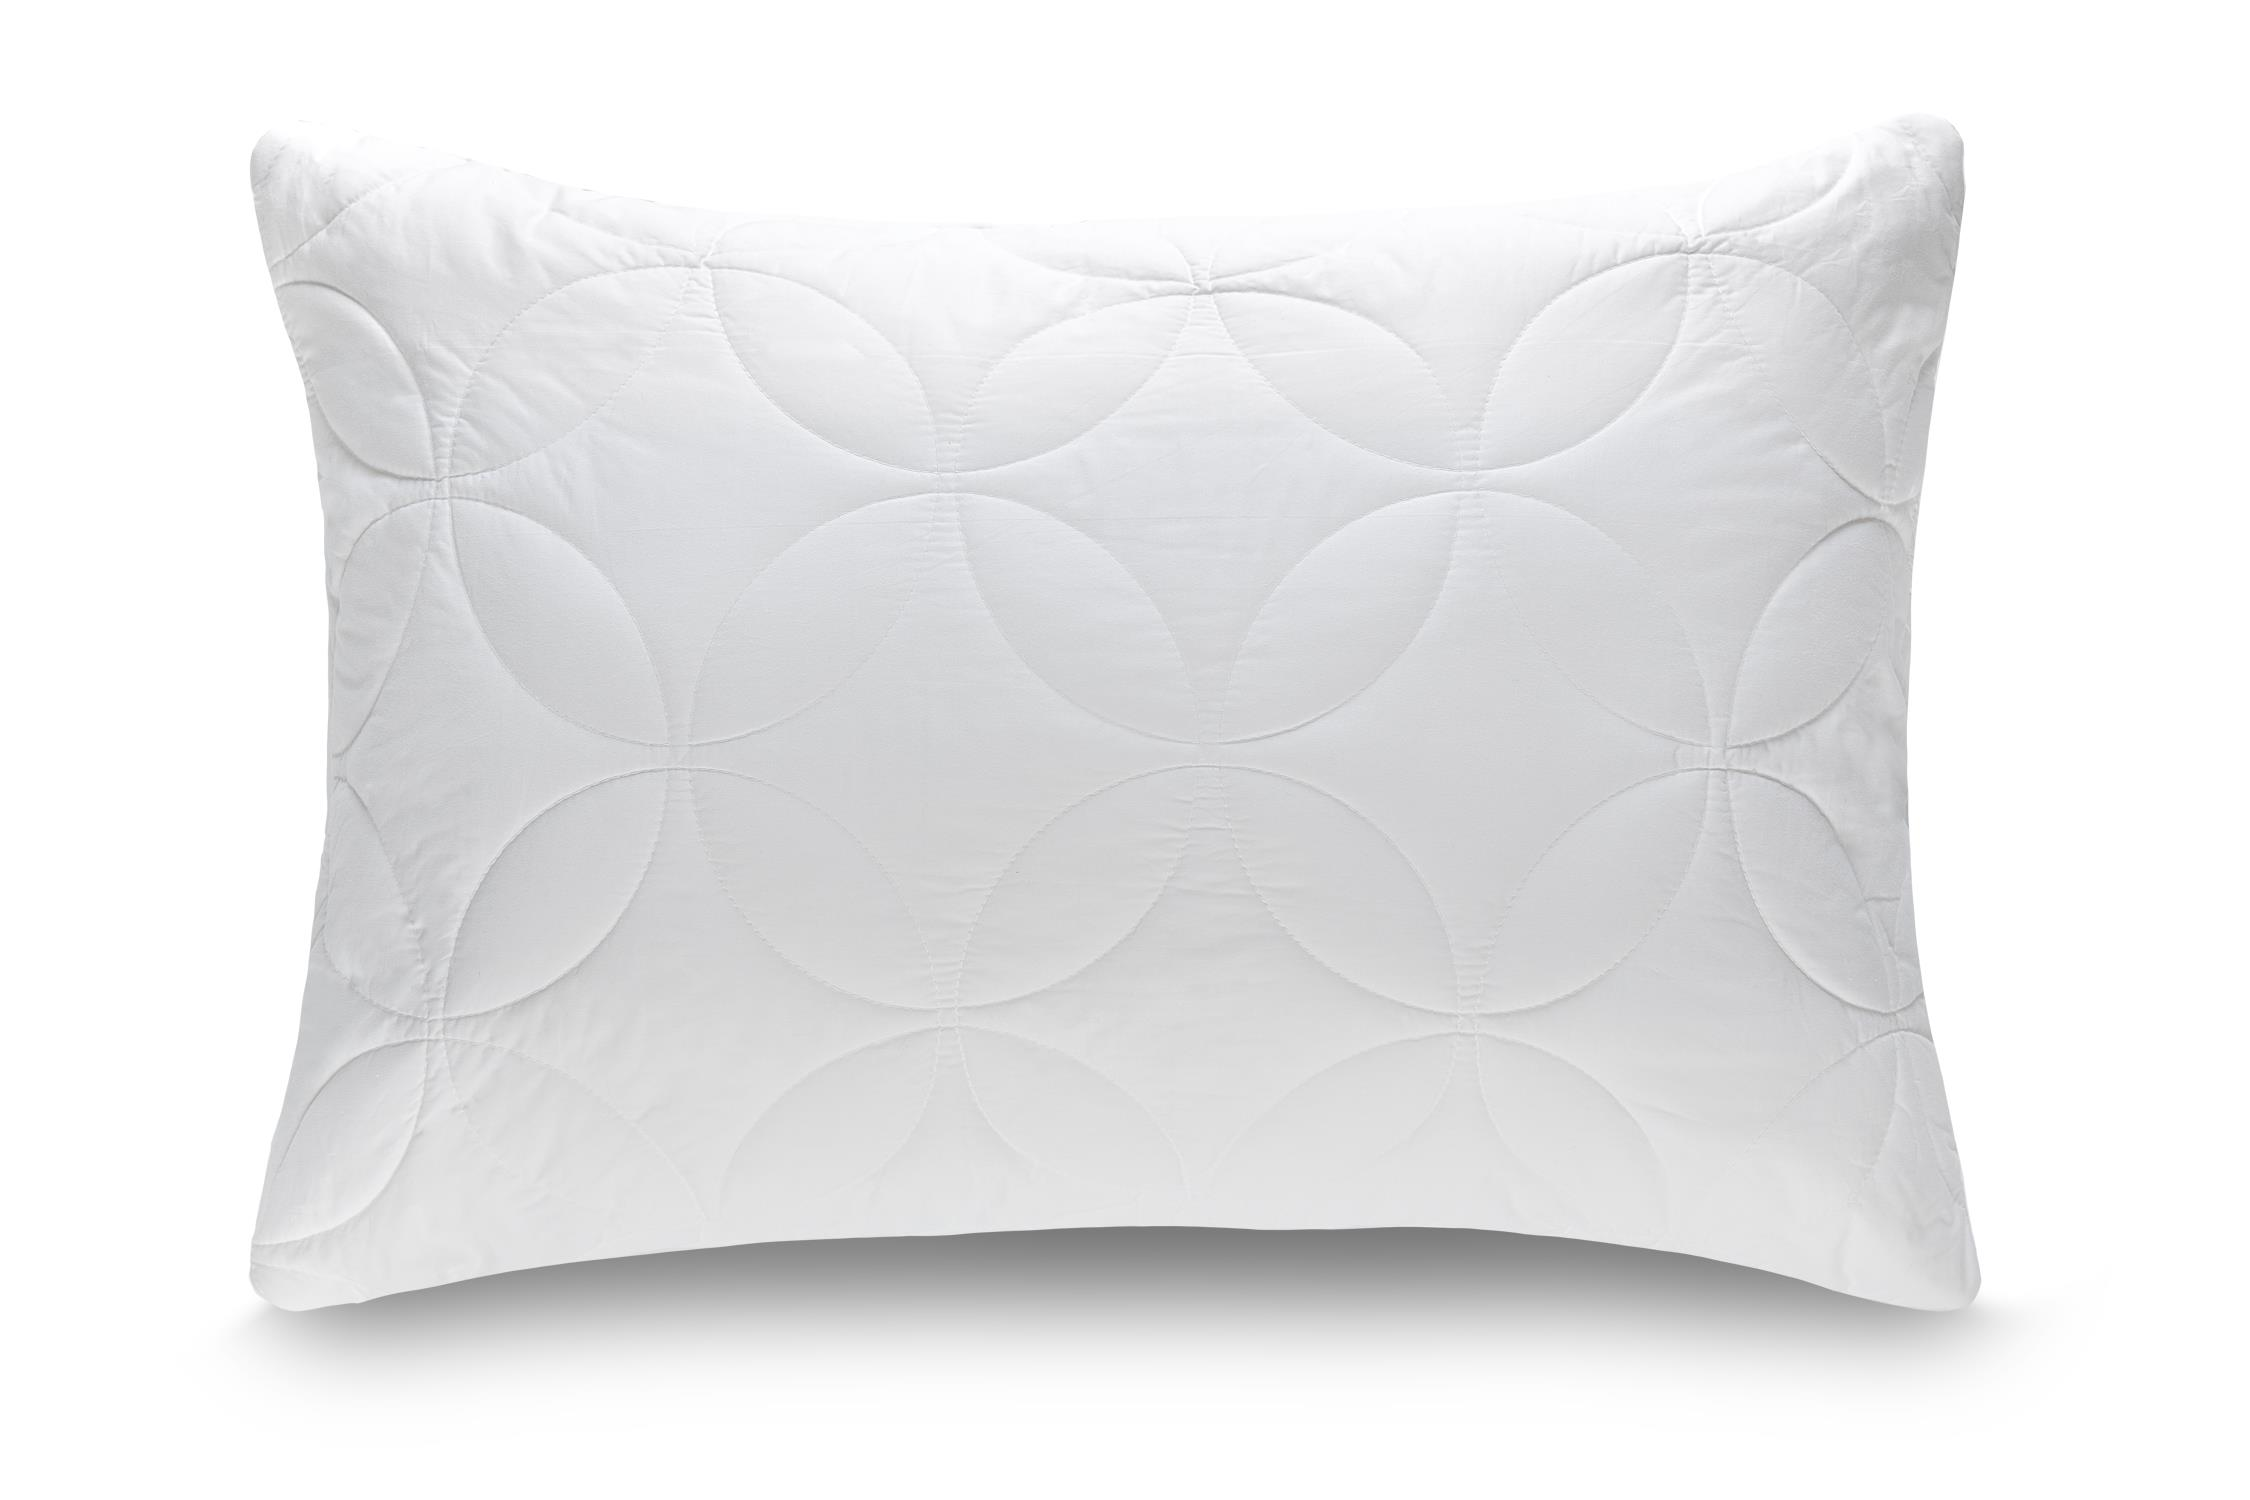 cloud beyond tempur soft bath pedic bed from and lofty king buy pillow tempurpedic